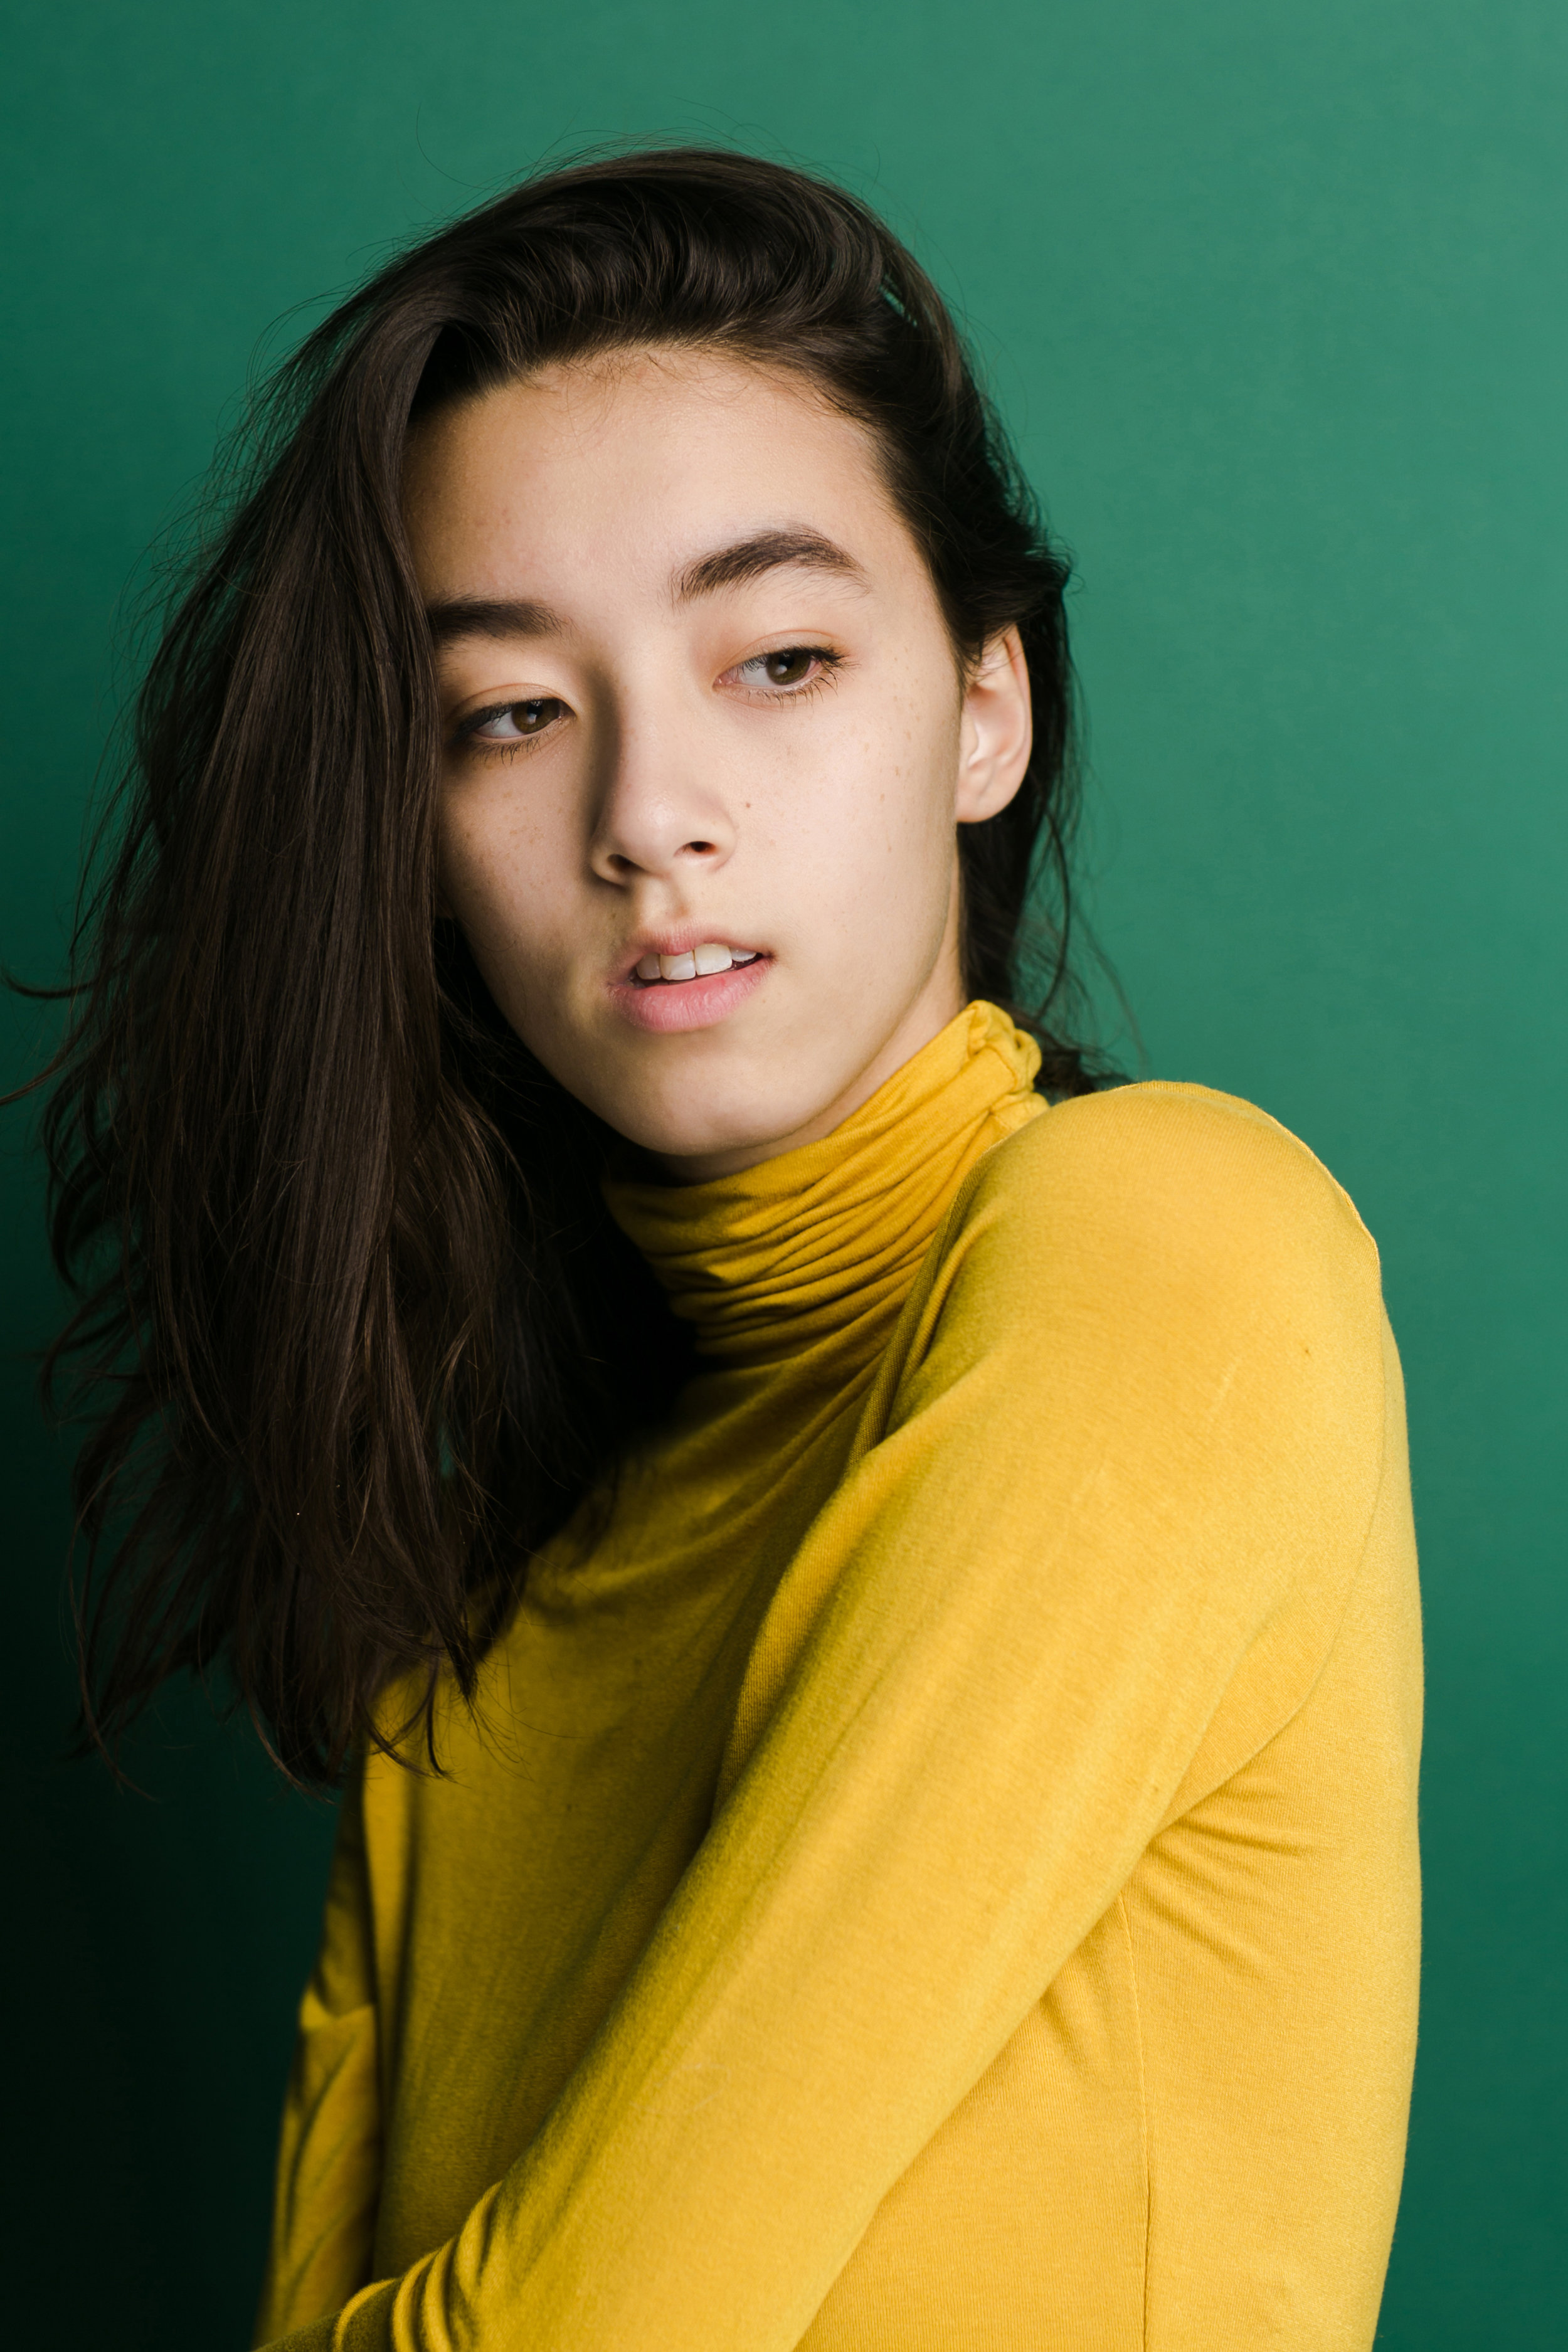 Paige-Newton-Austin-Model-Test-Shoot